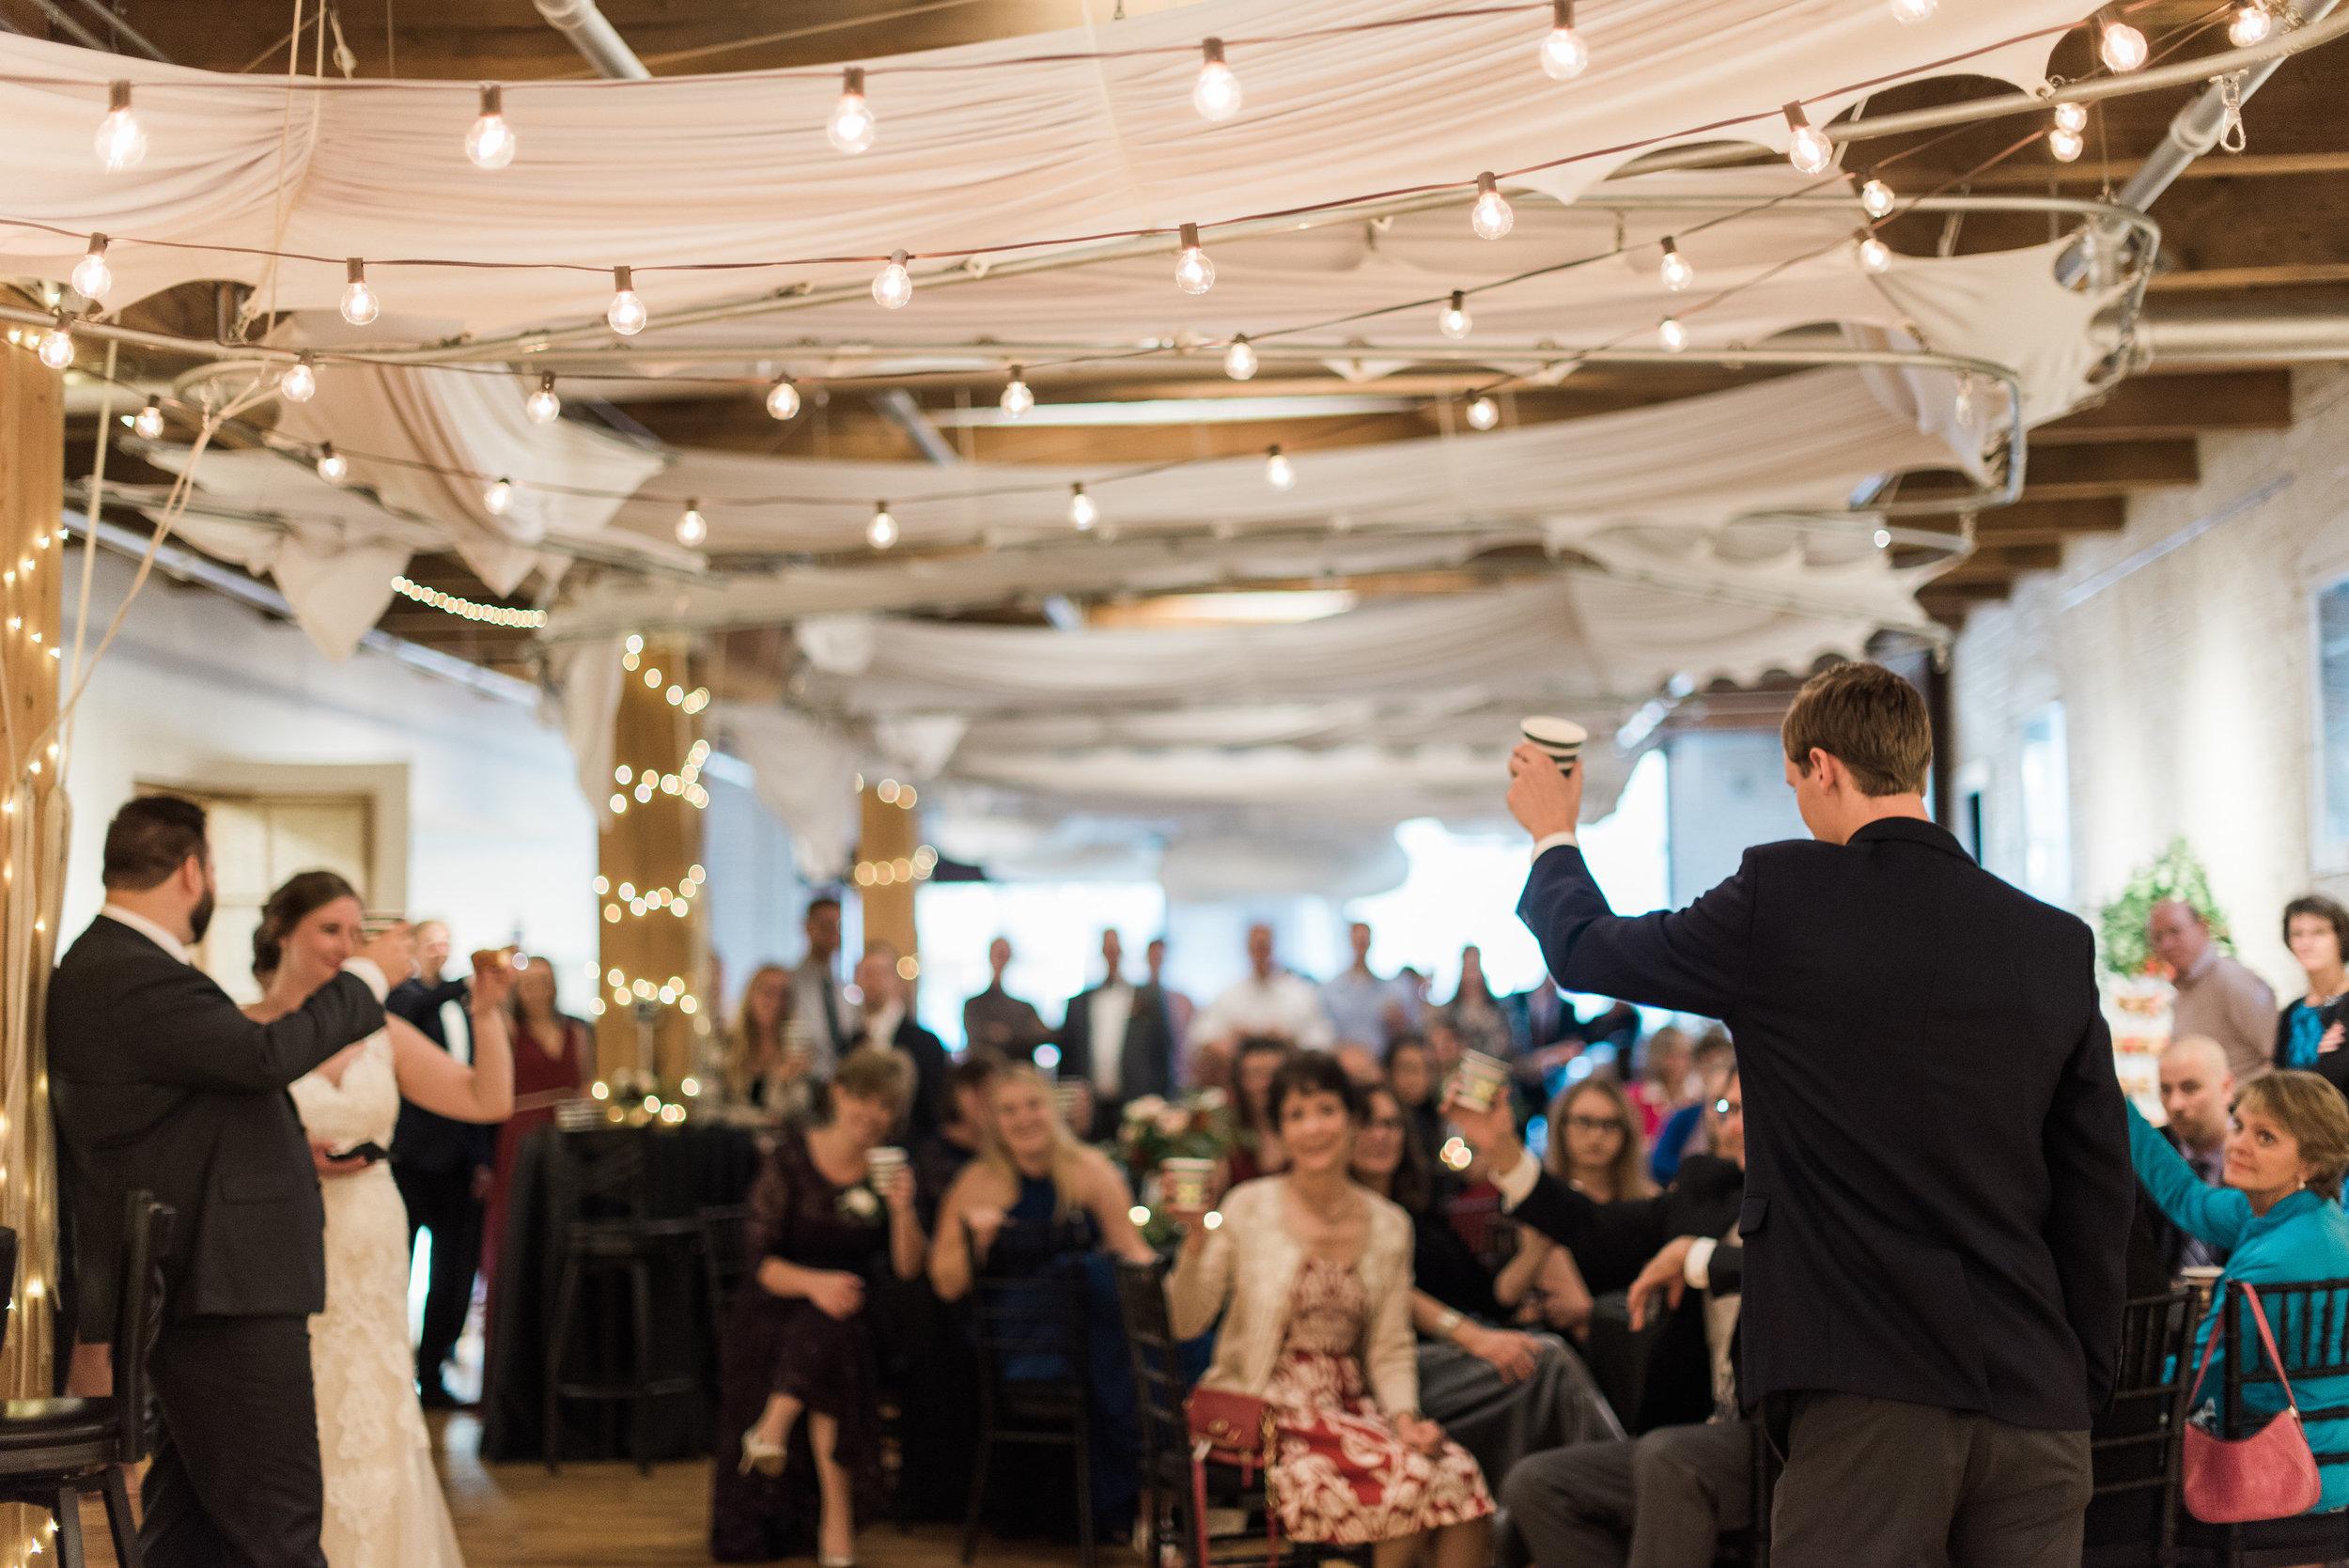 Industrial Minneapolis wedding venue